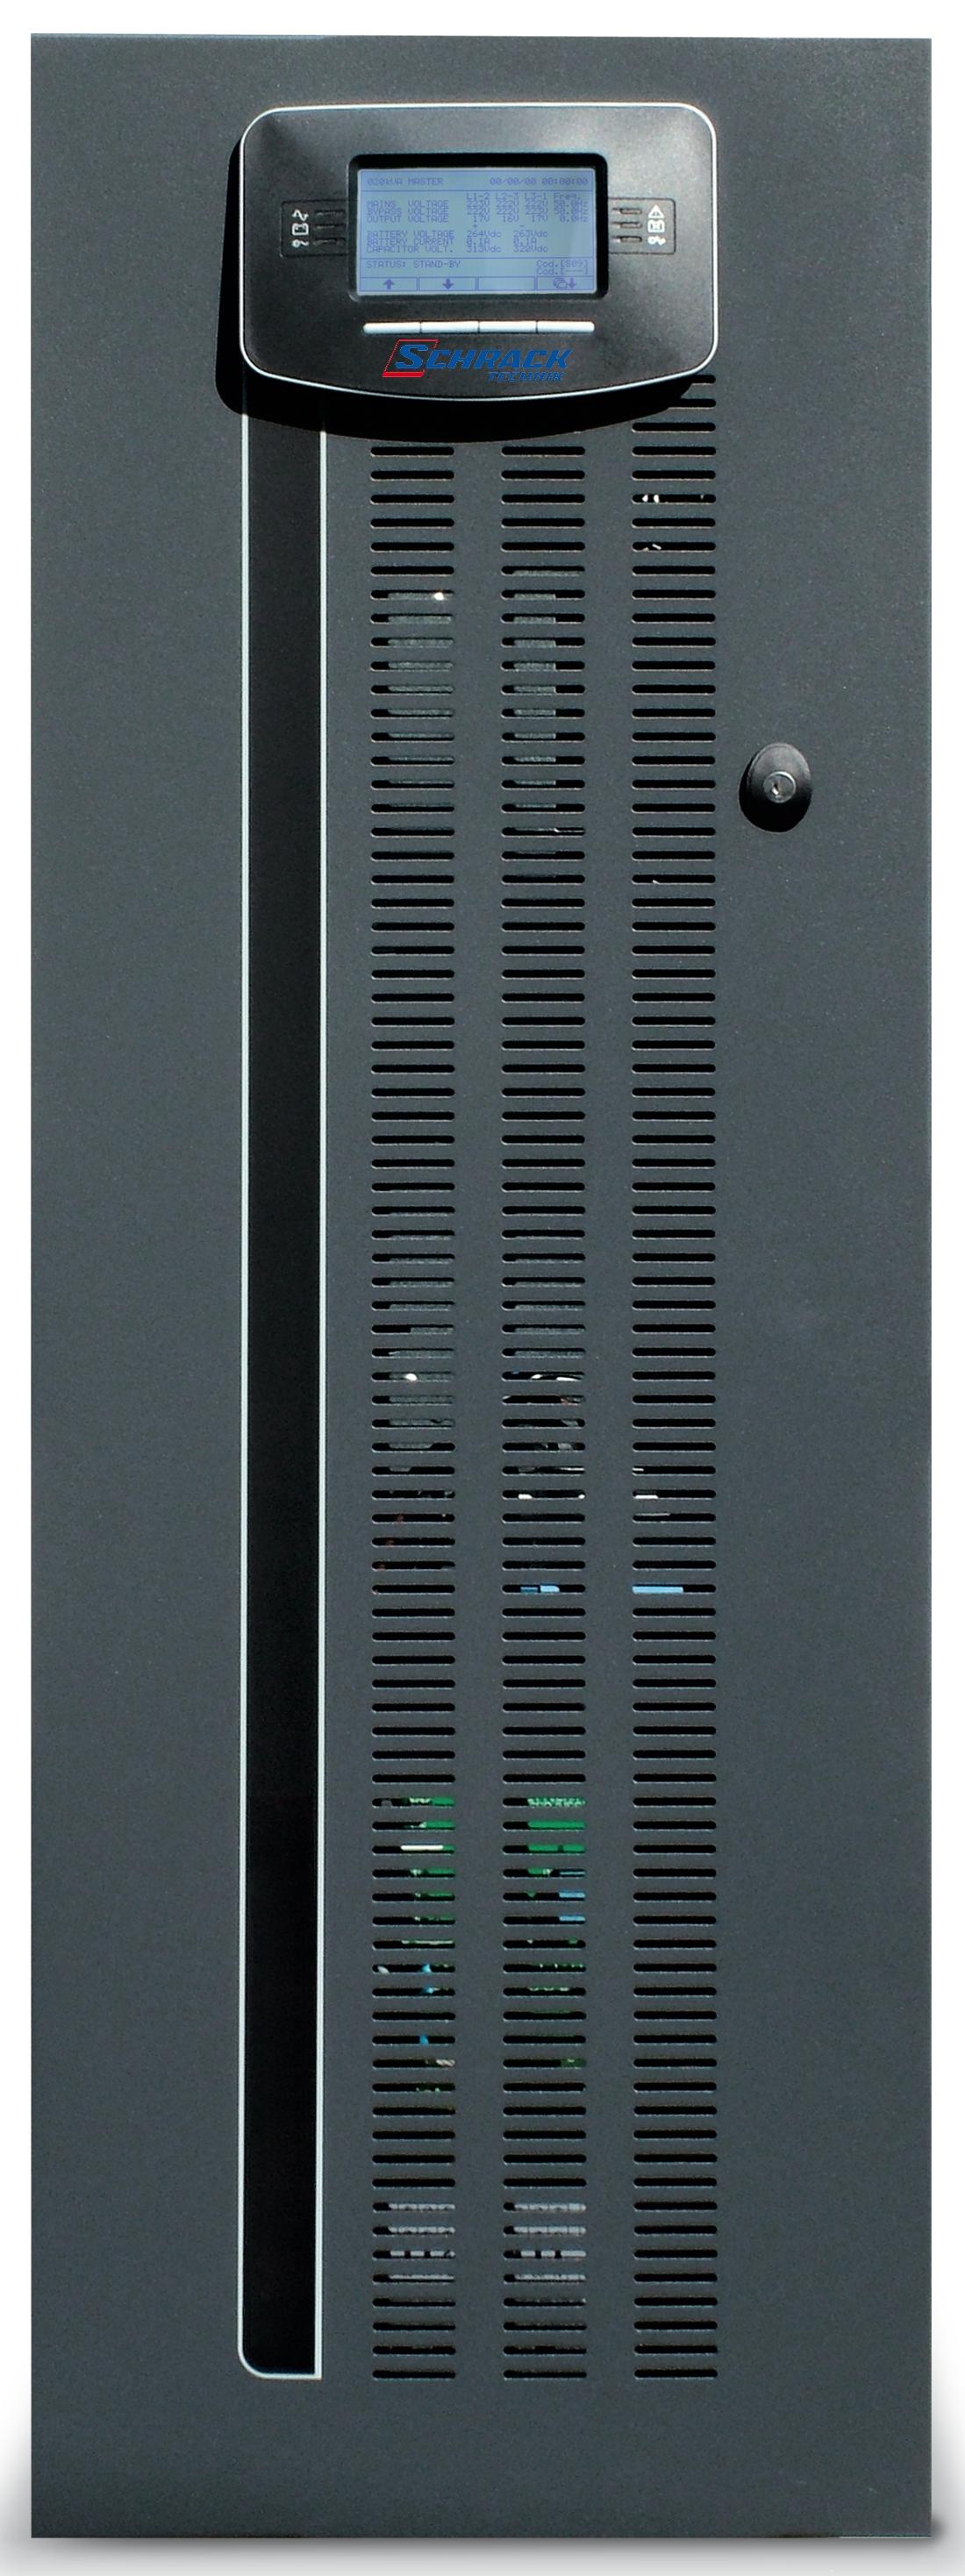 1 Stk USV AVARA Multi 15kVA 13,5kW 0Min. 3ph/1ph/Online USMLM15XA0